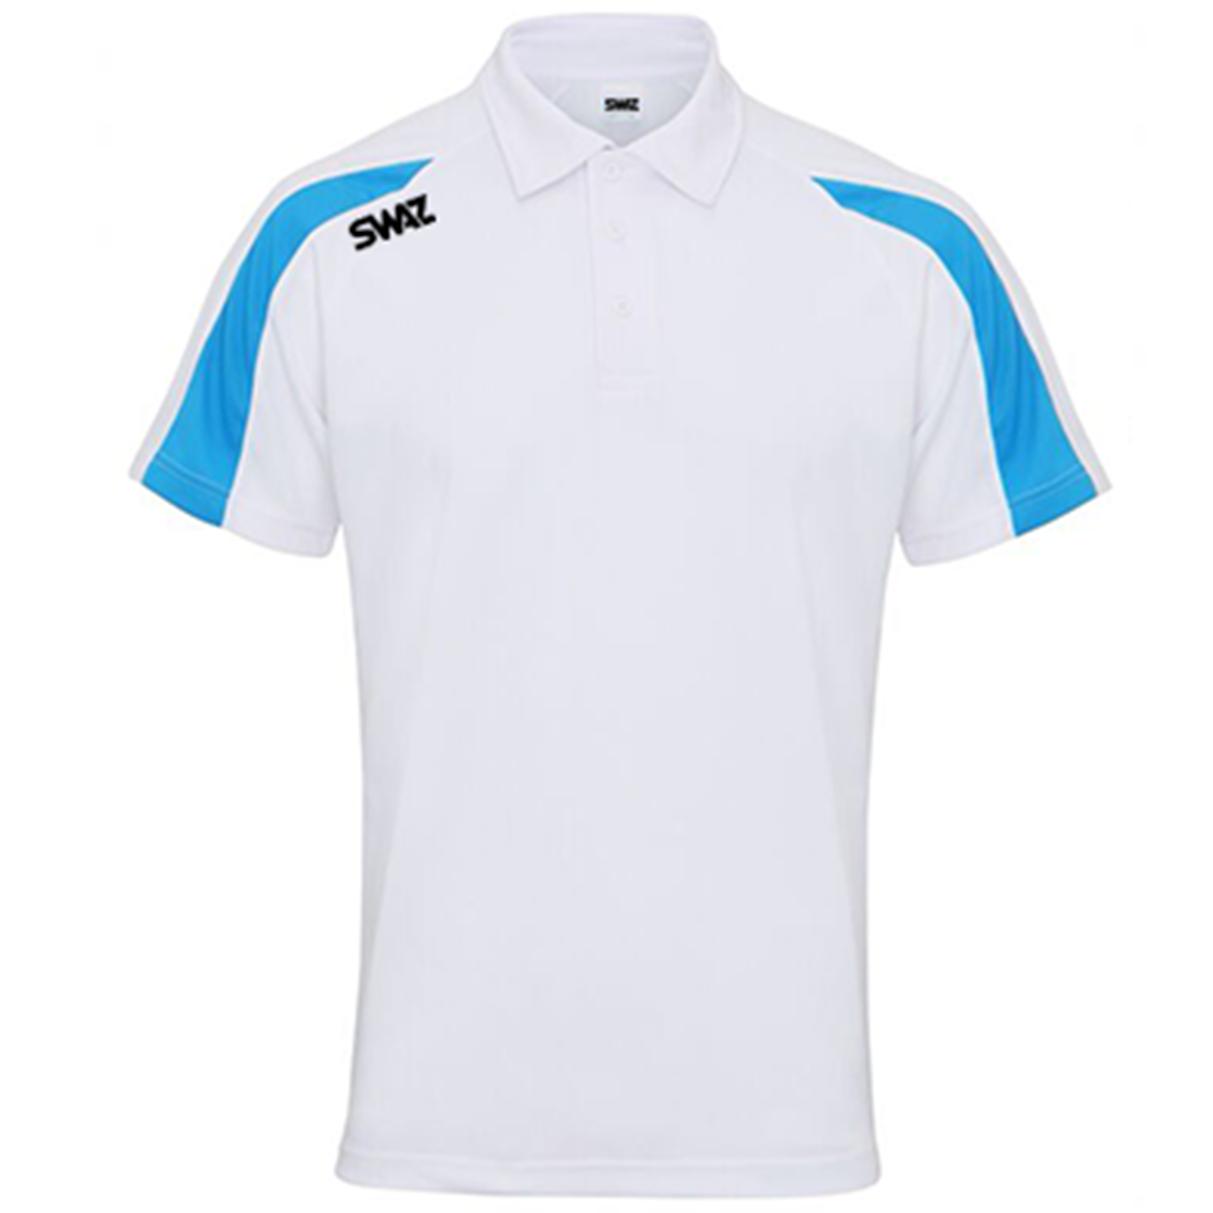 SWAZ Premier Polo – White/Blue